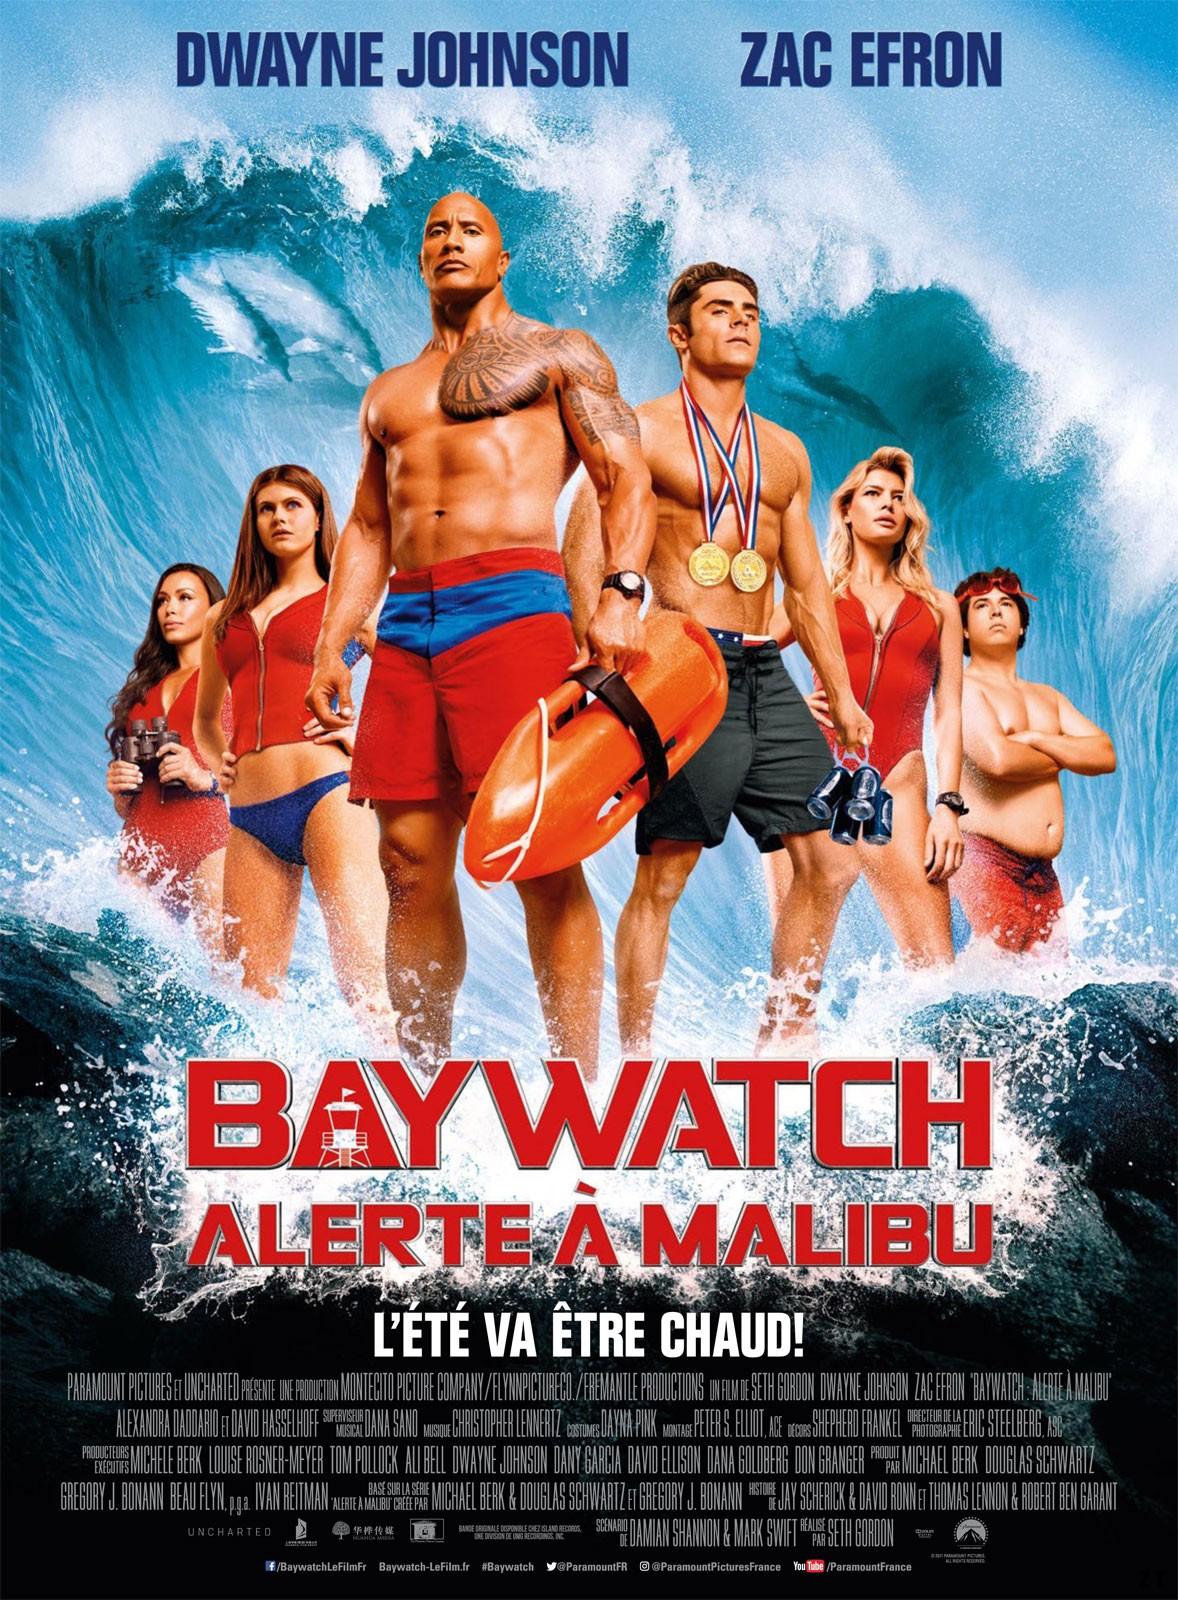 Baywatch - Alerte à Malibu FRENCH BluRay 720p 2017